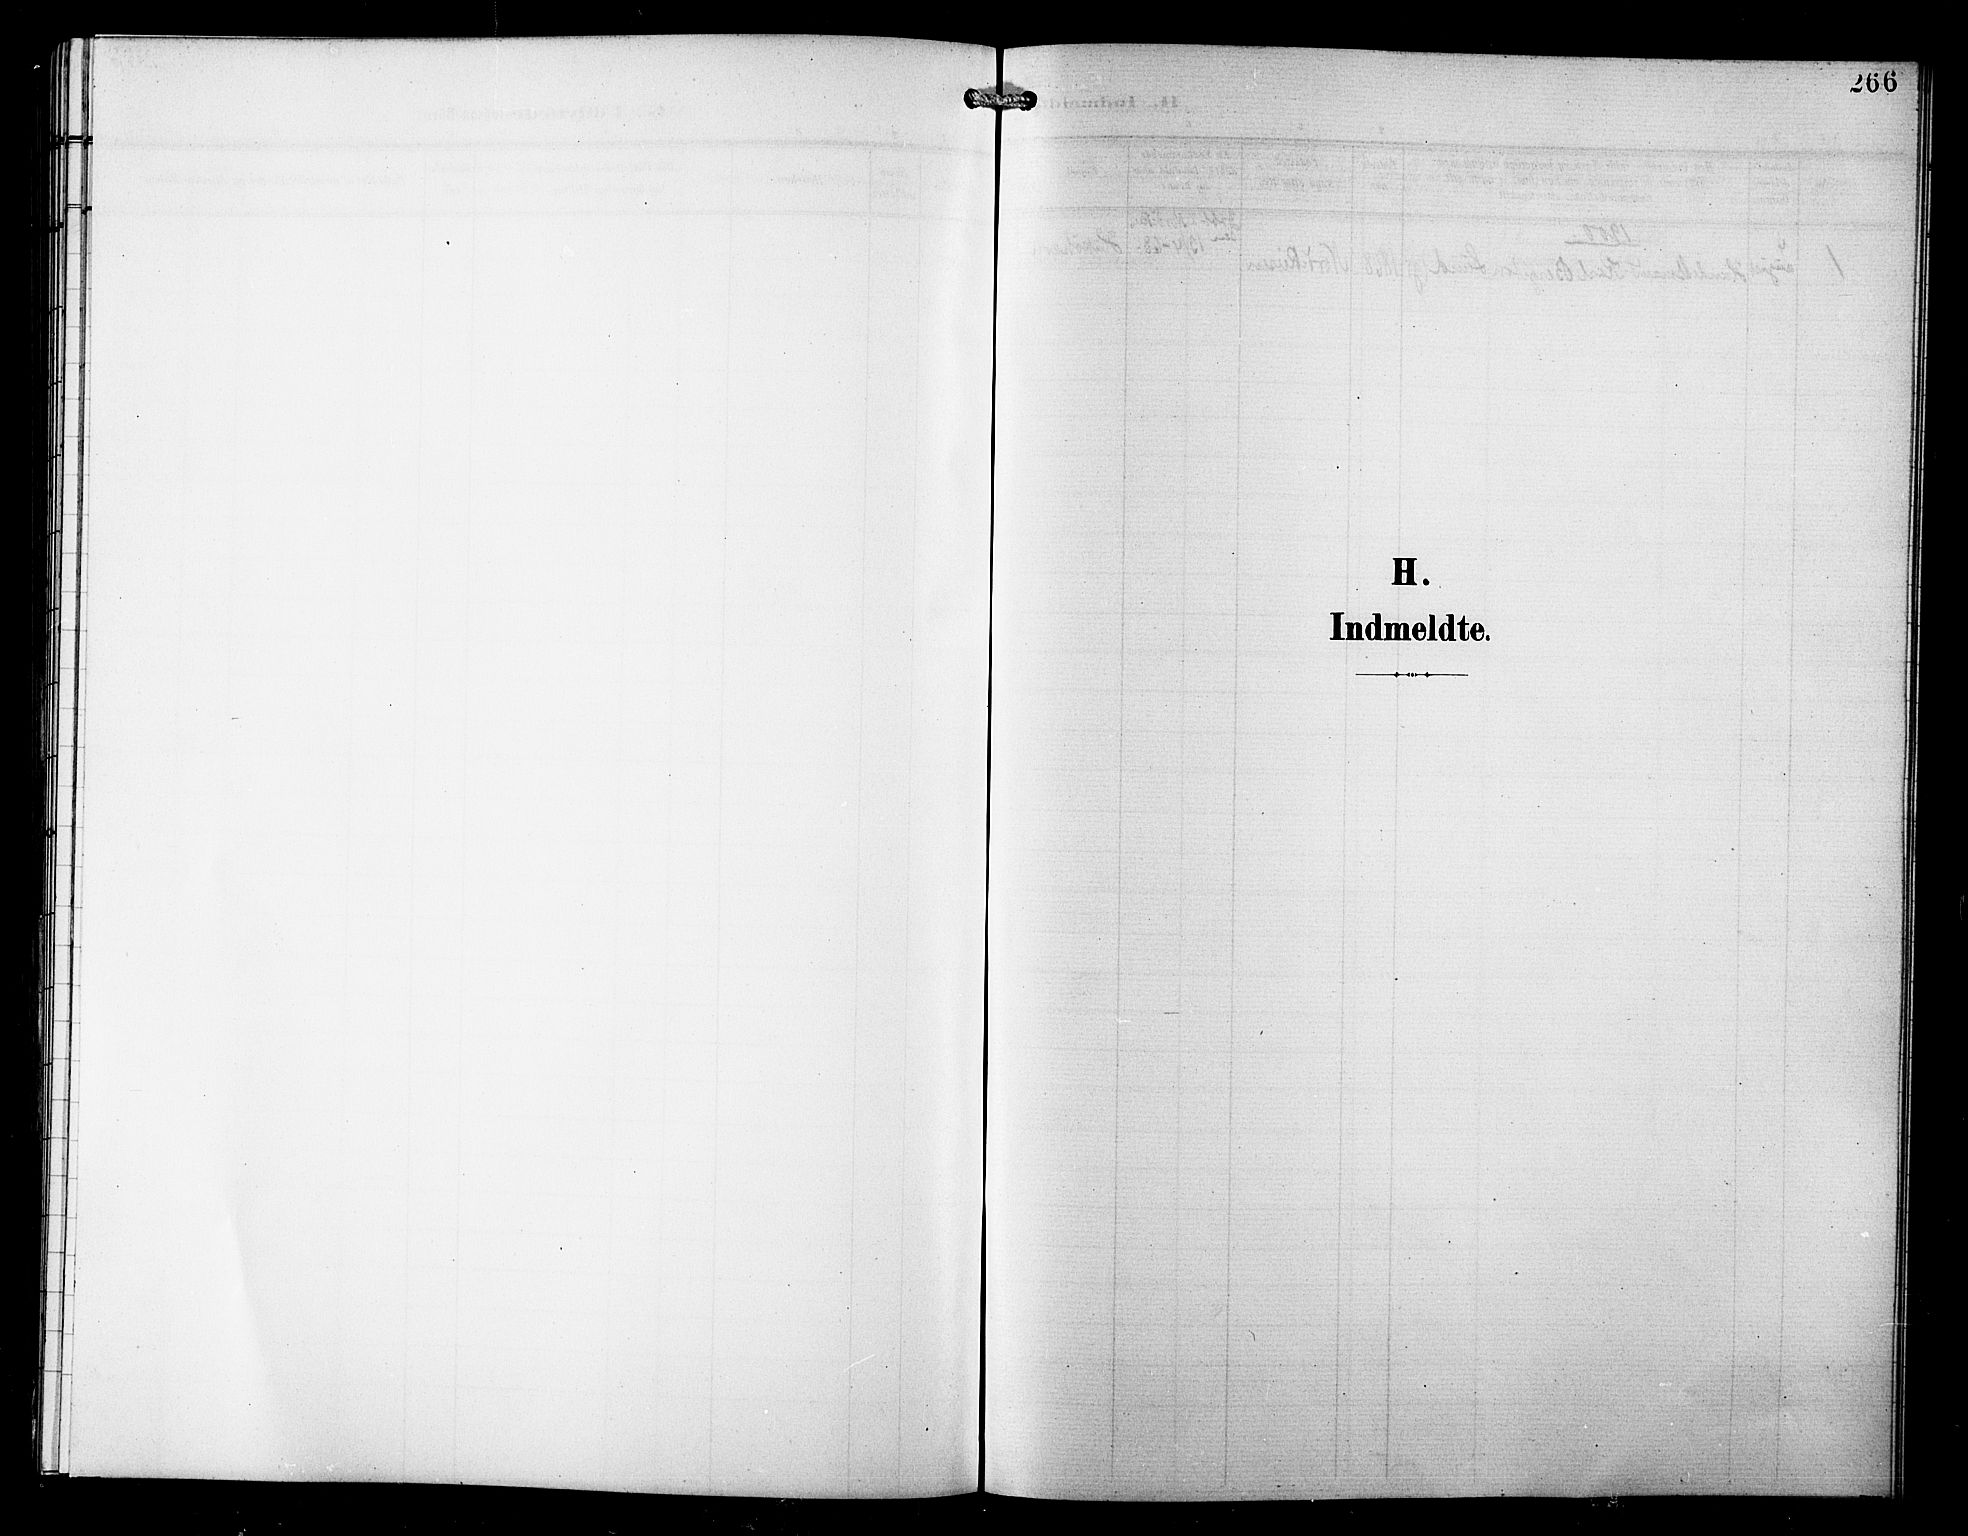 SATØ, Skjervøy sokneprestkontor, H/Ha/Hab/L0008klokker: Klokkerbok nr. 8, 1900-1910, s. 266